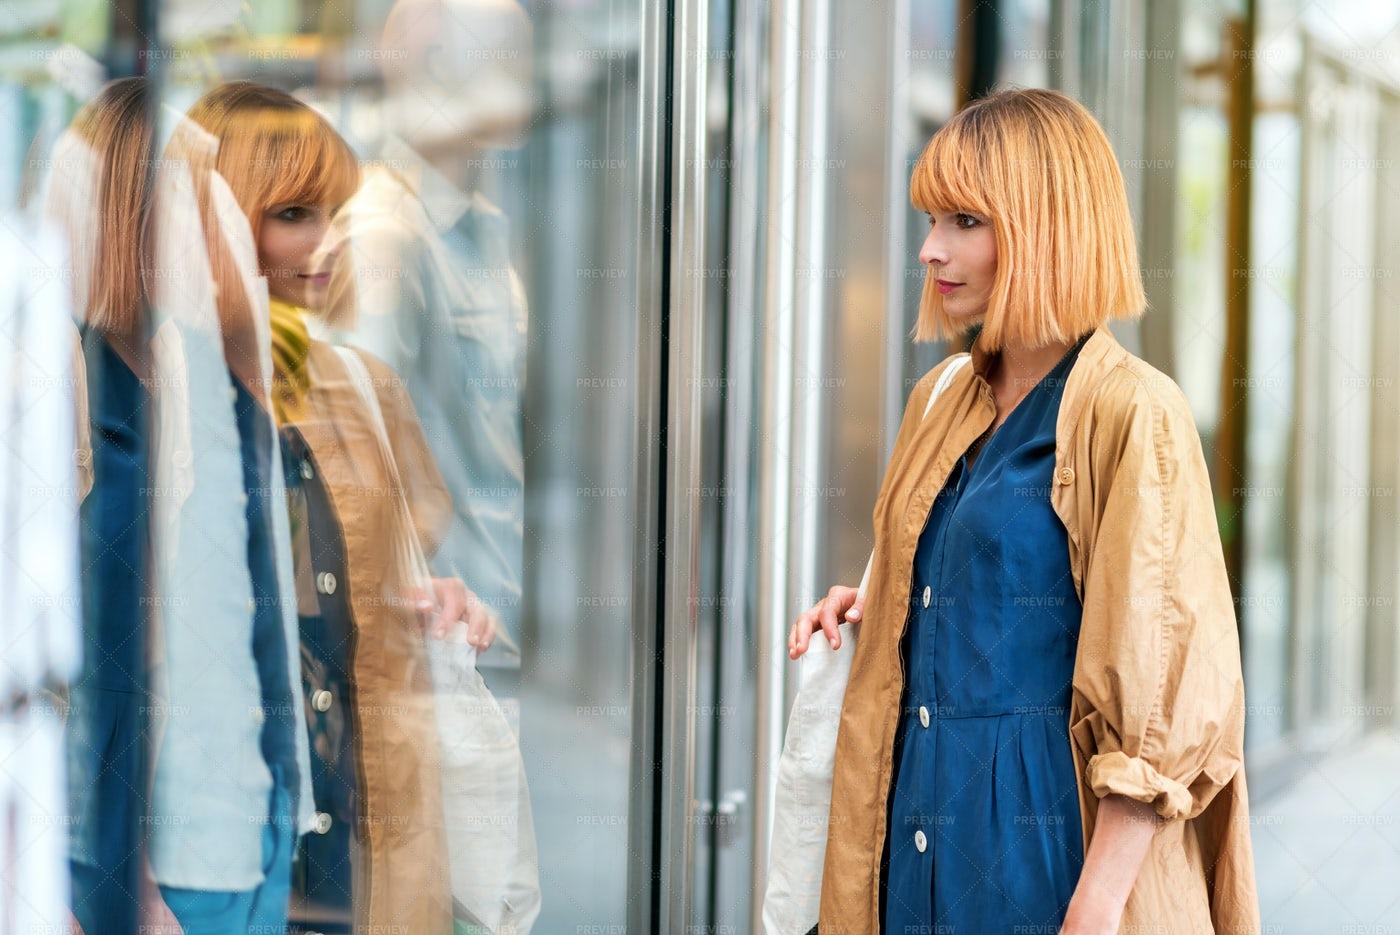 Stylish Woman Window Shopping: Stock Photos